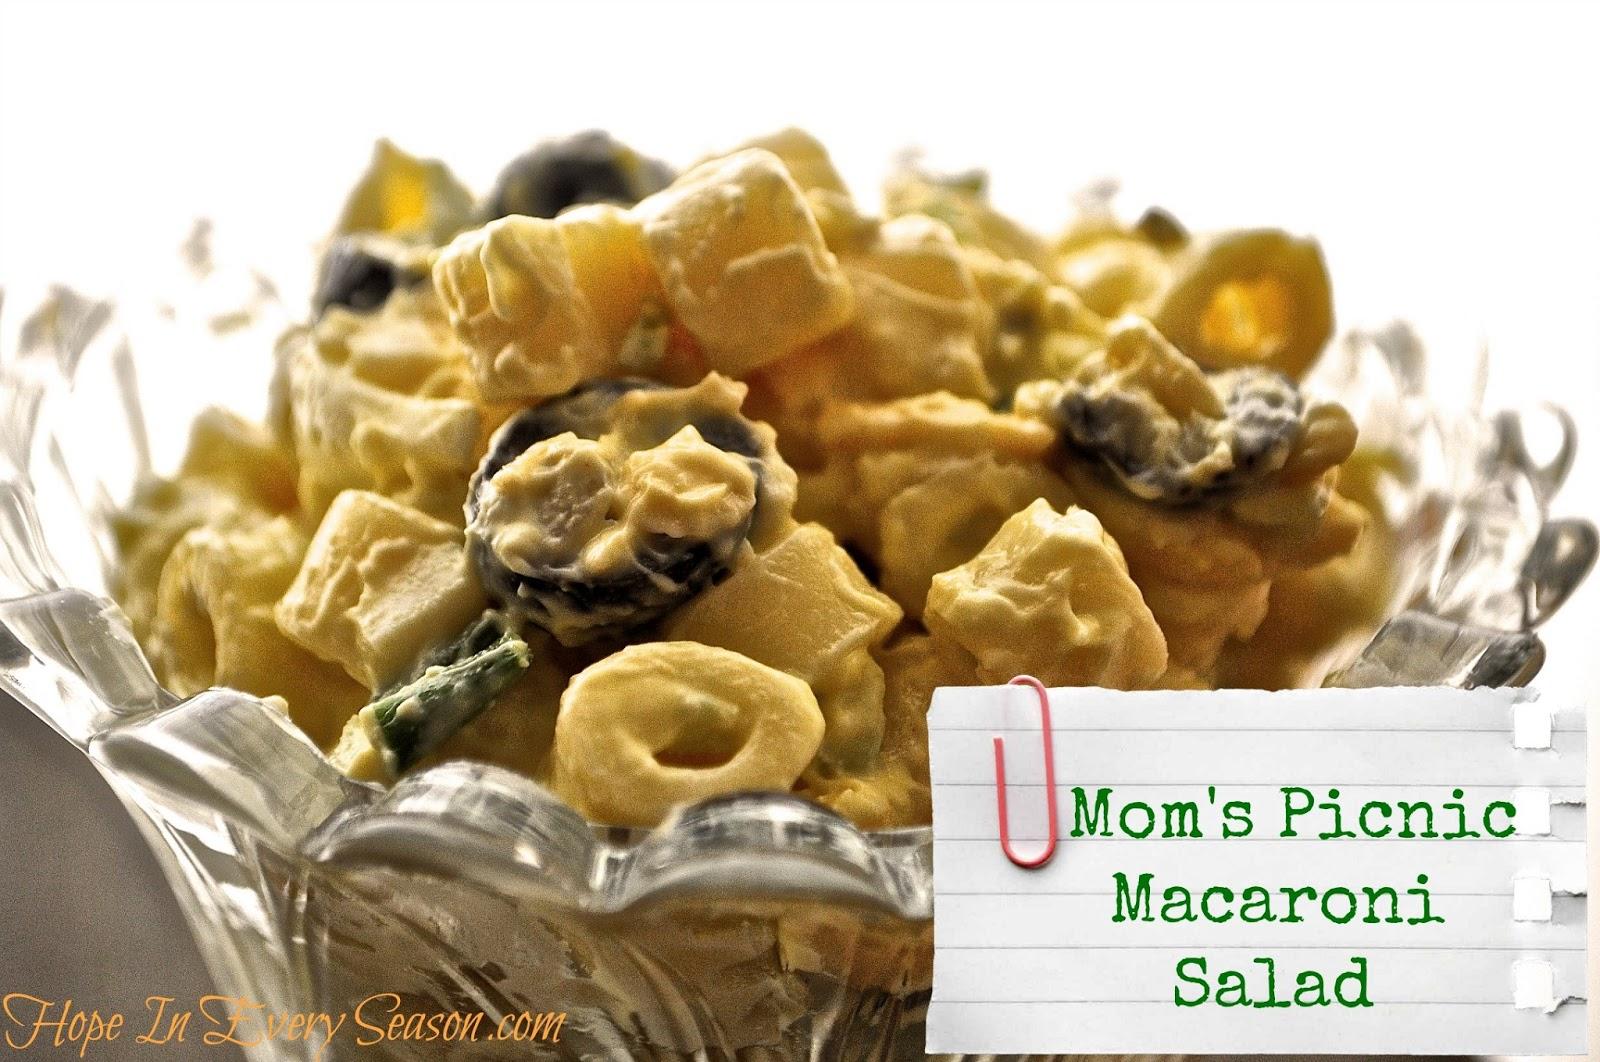 Hope In Every Season: Mom's Picnic Macaroni Salad